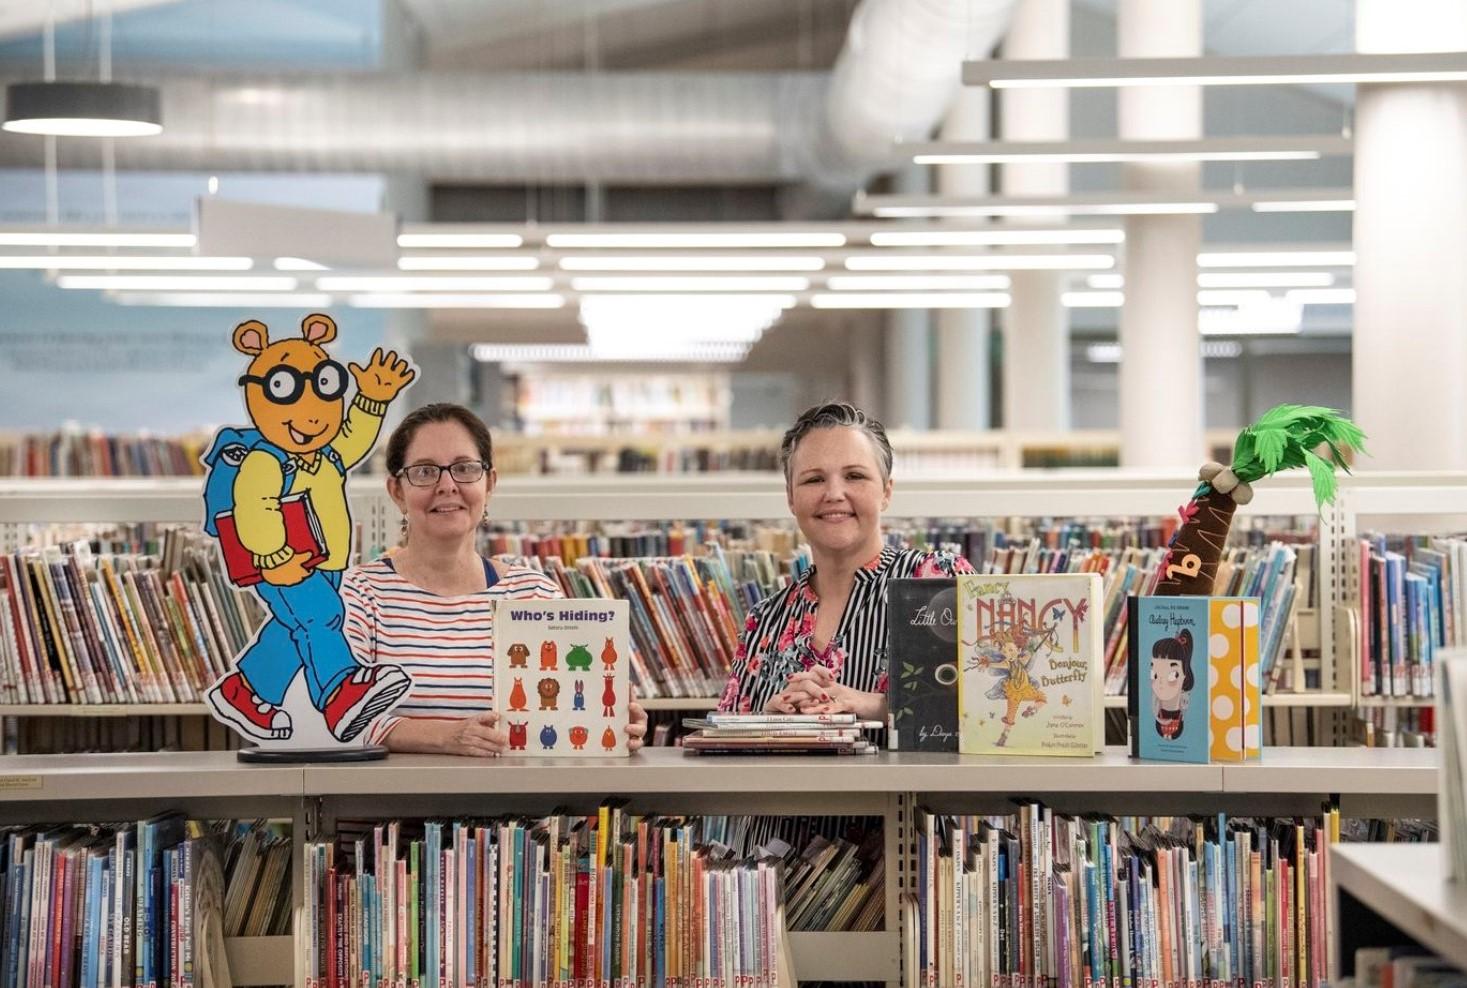 Multimillion-Dollar Renovation Proves Local Libraries Still Community Anchors in 21st Century